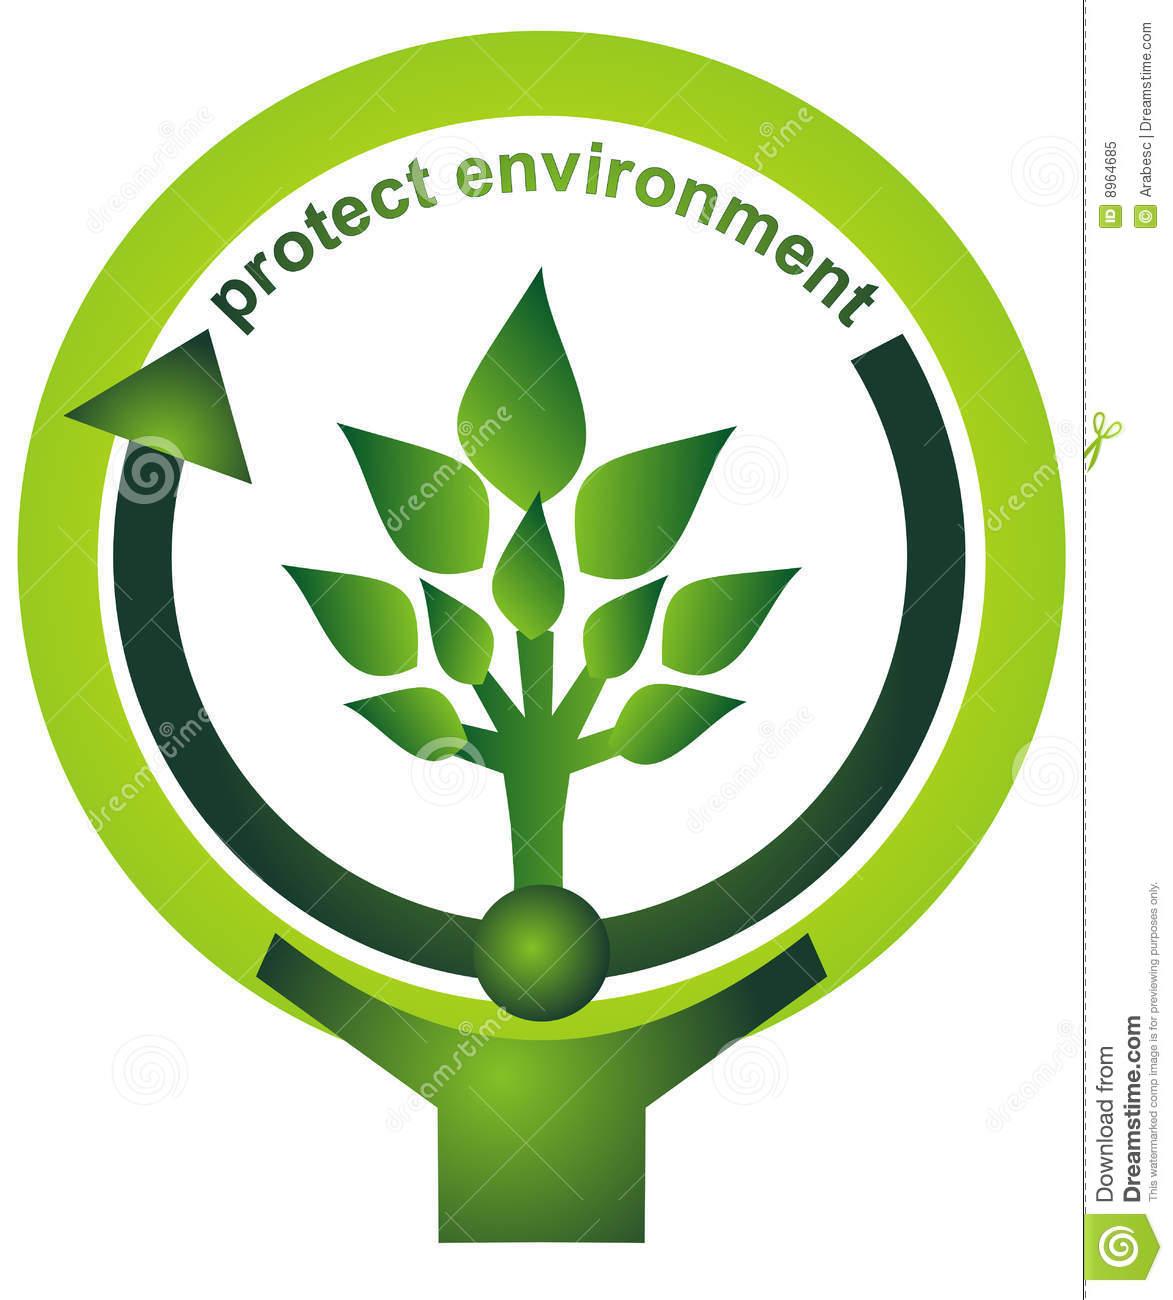 Protect Environment Royalty Free Stock Photo.